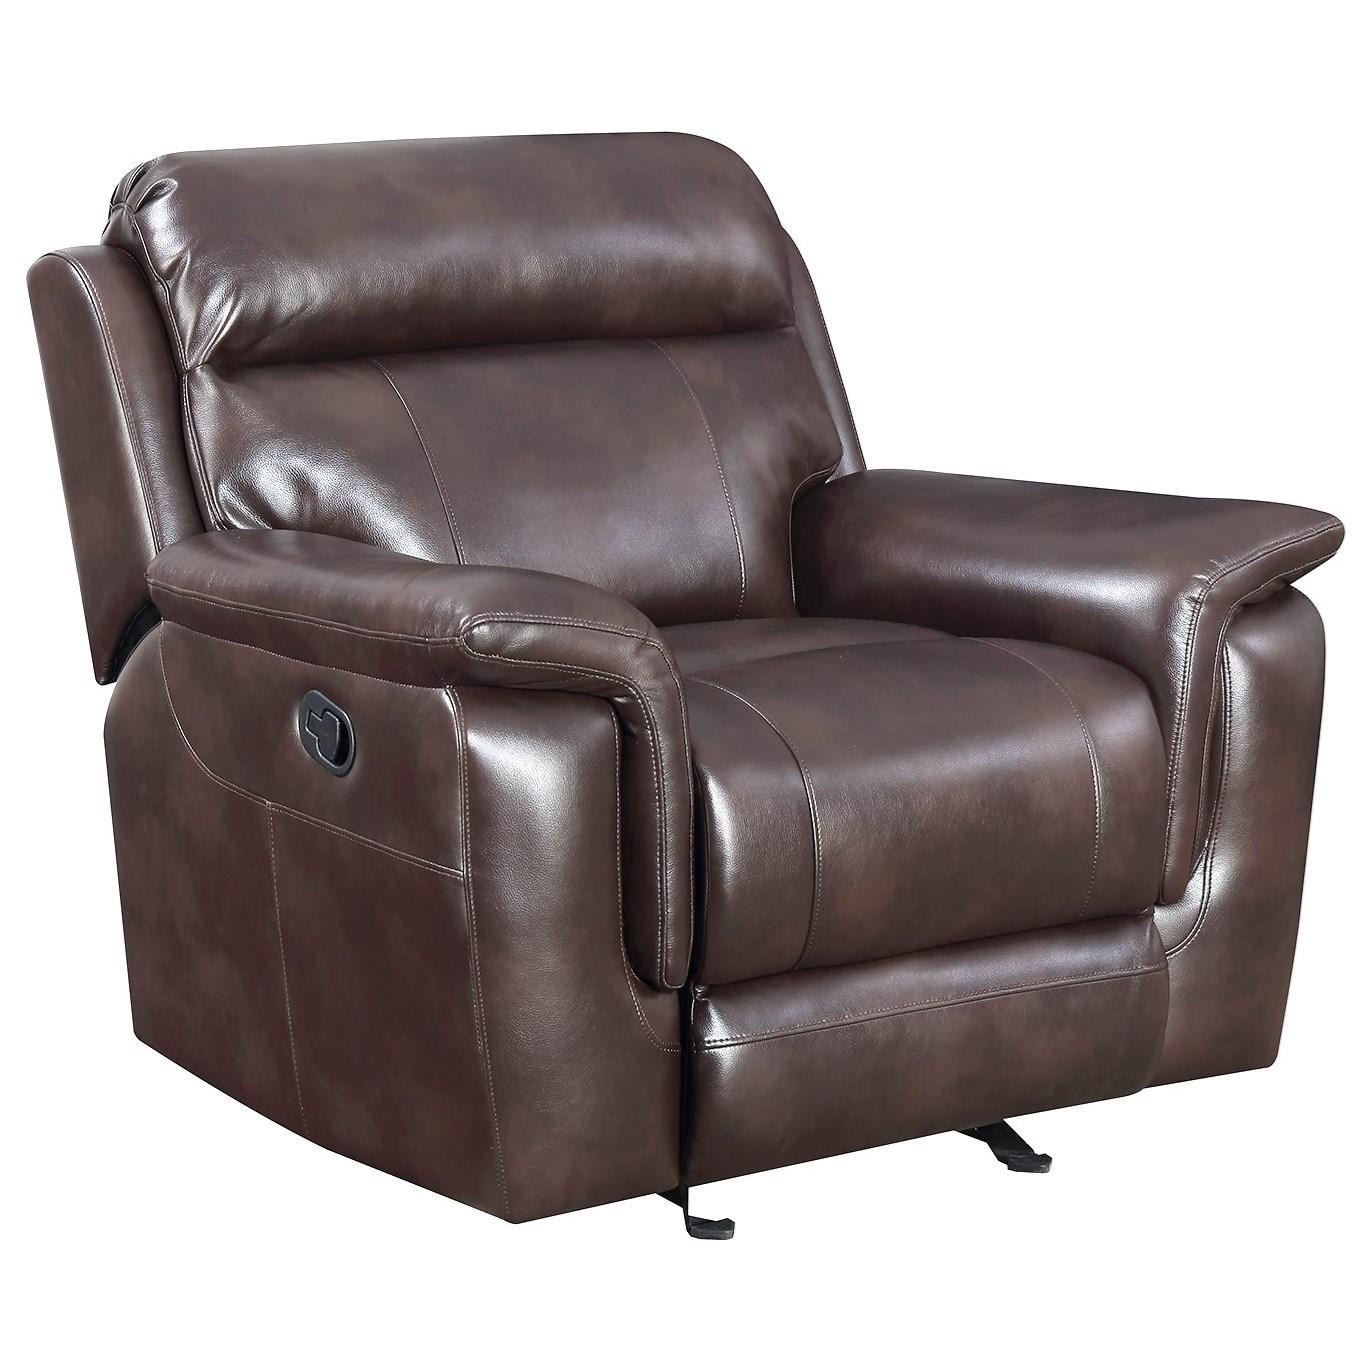 Prime Dakota Glider Reclining Chair - Item Number: DK850CC